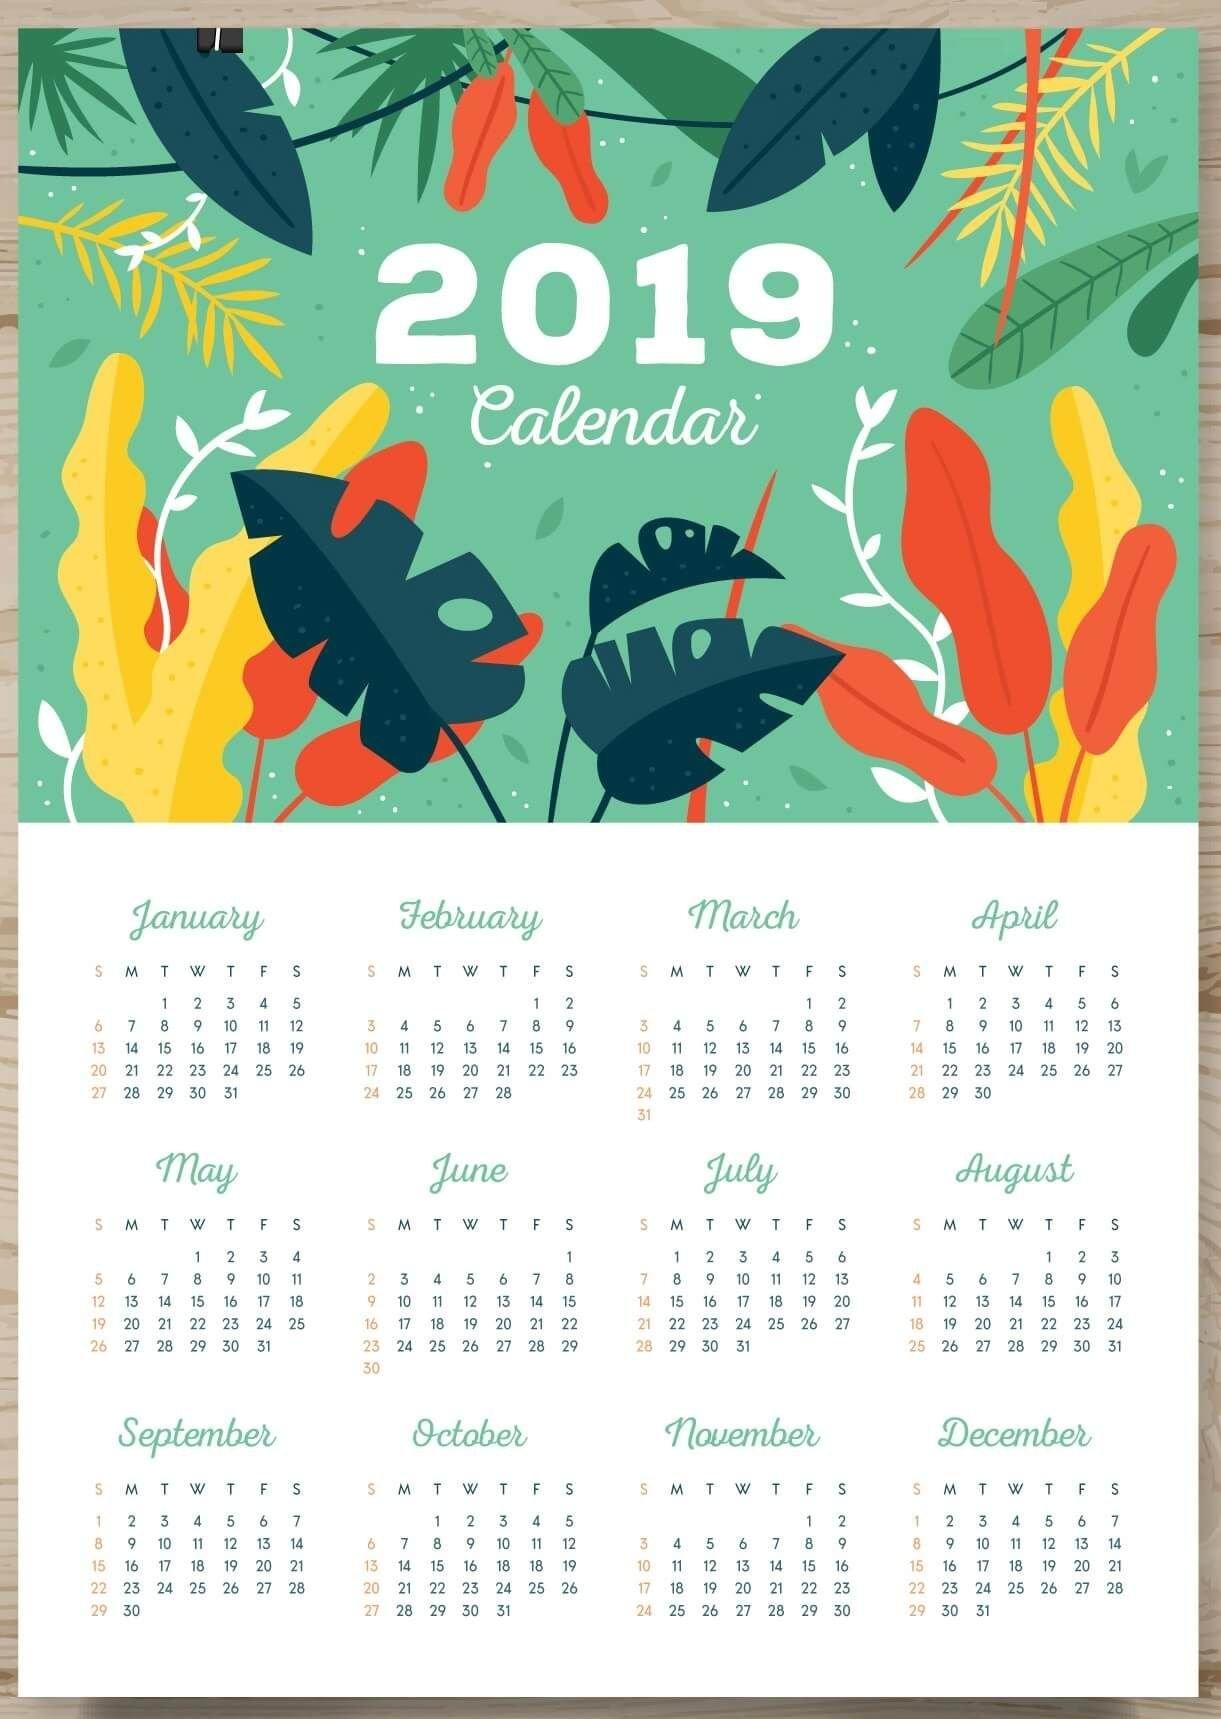 One Page Calendar 2019 #2019Calendars | 2019 Calendar | Calendar 1 Page Yearly Calendar 2019